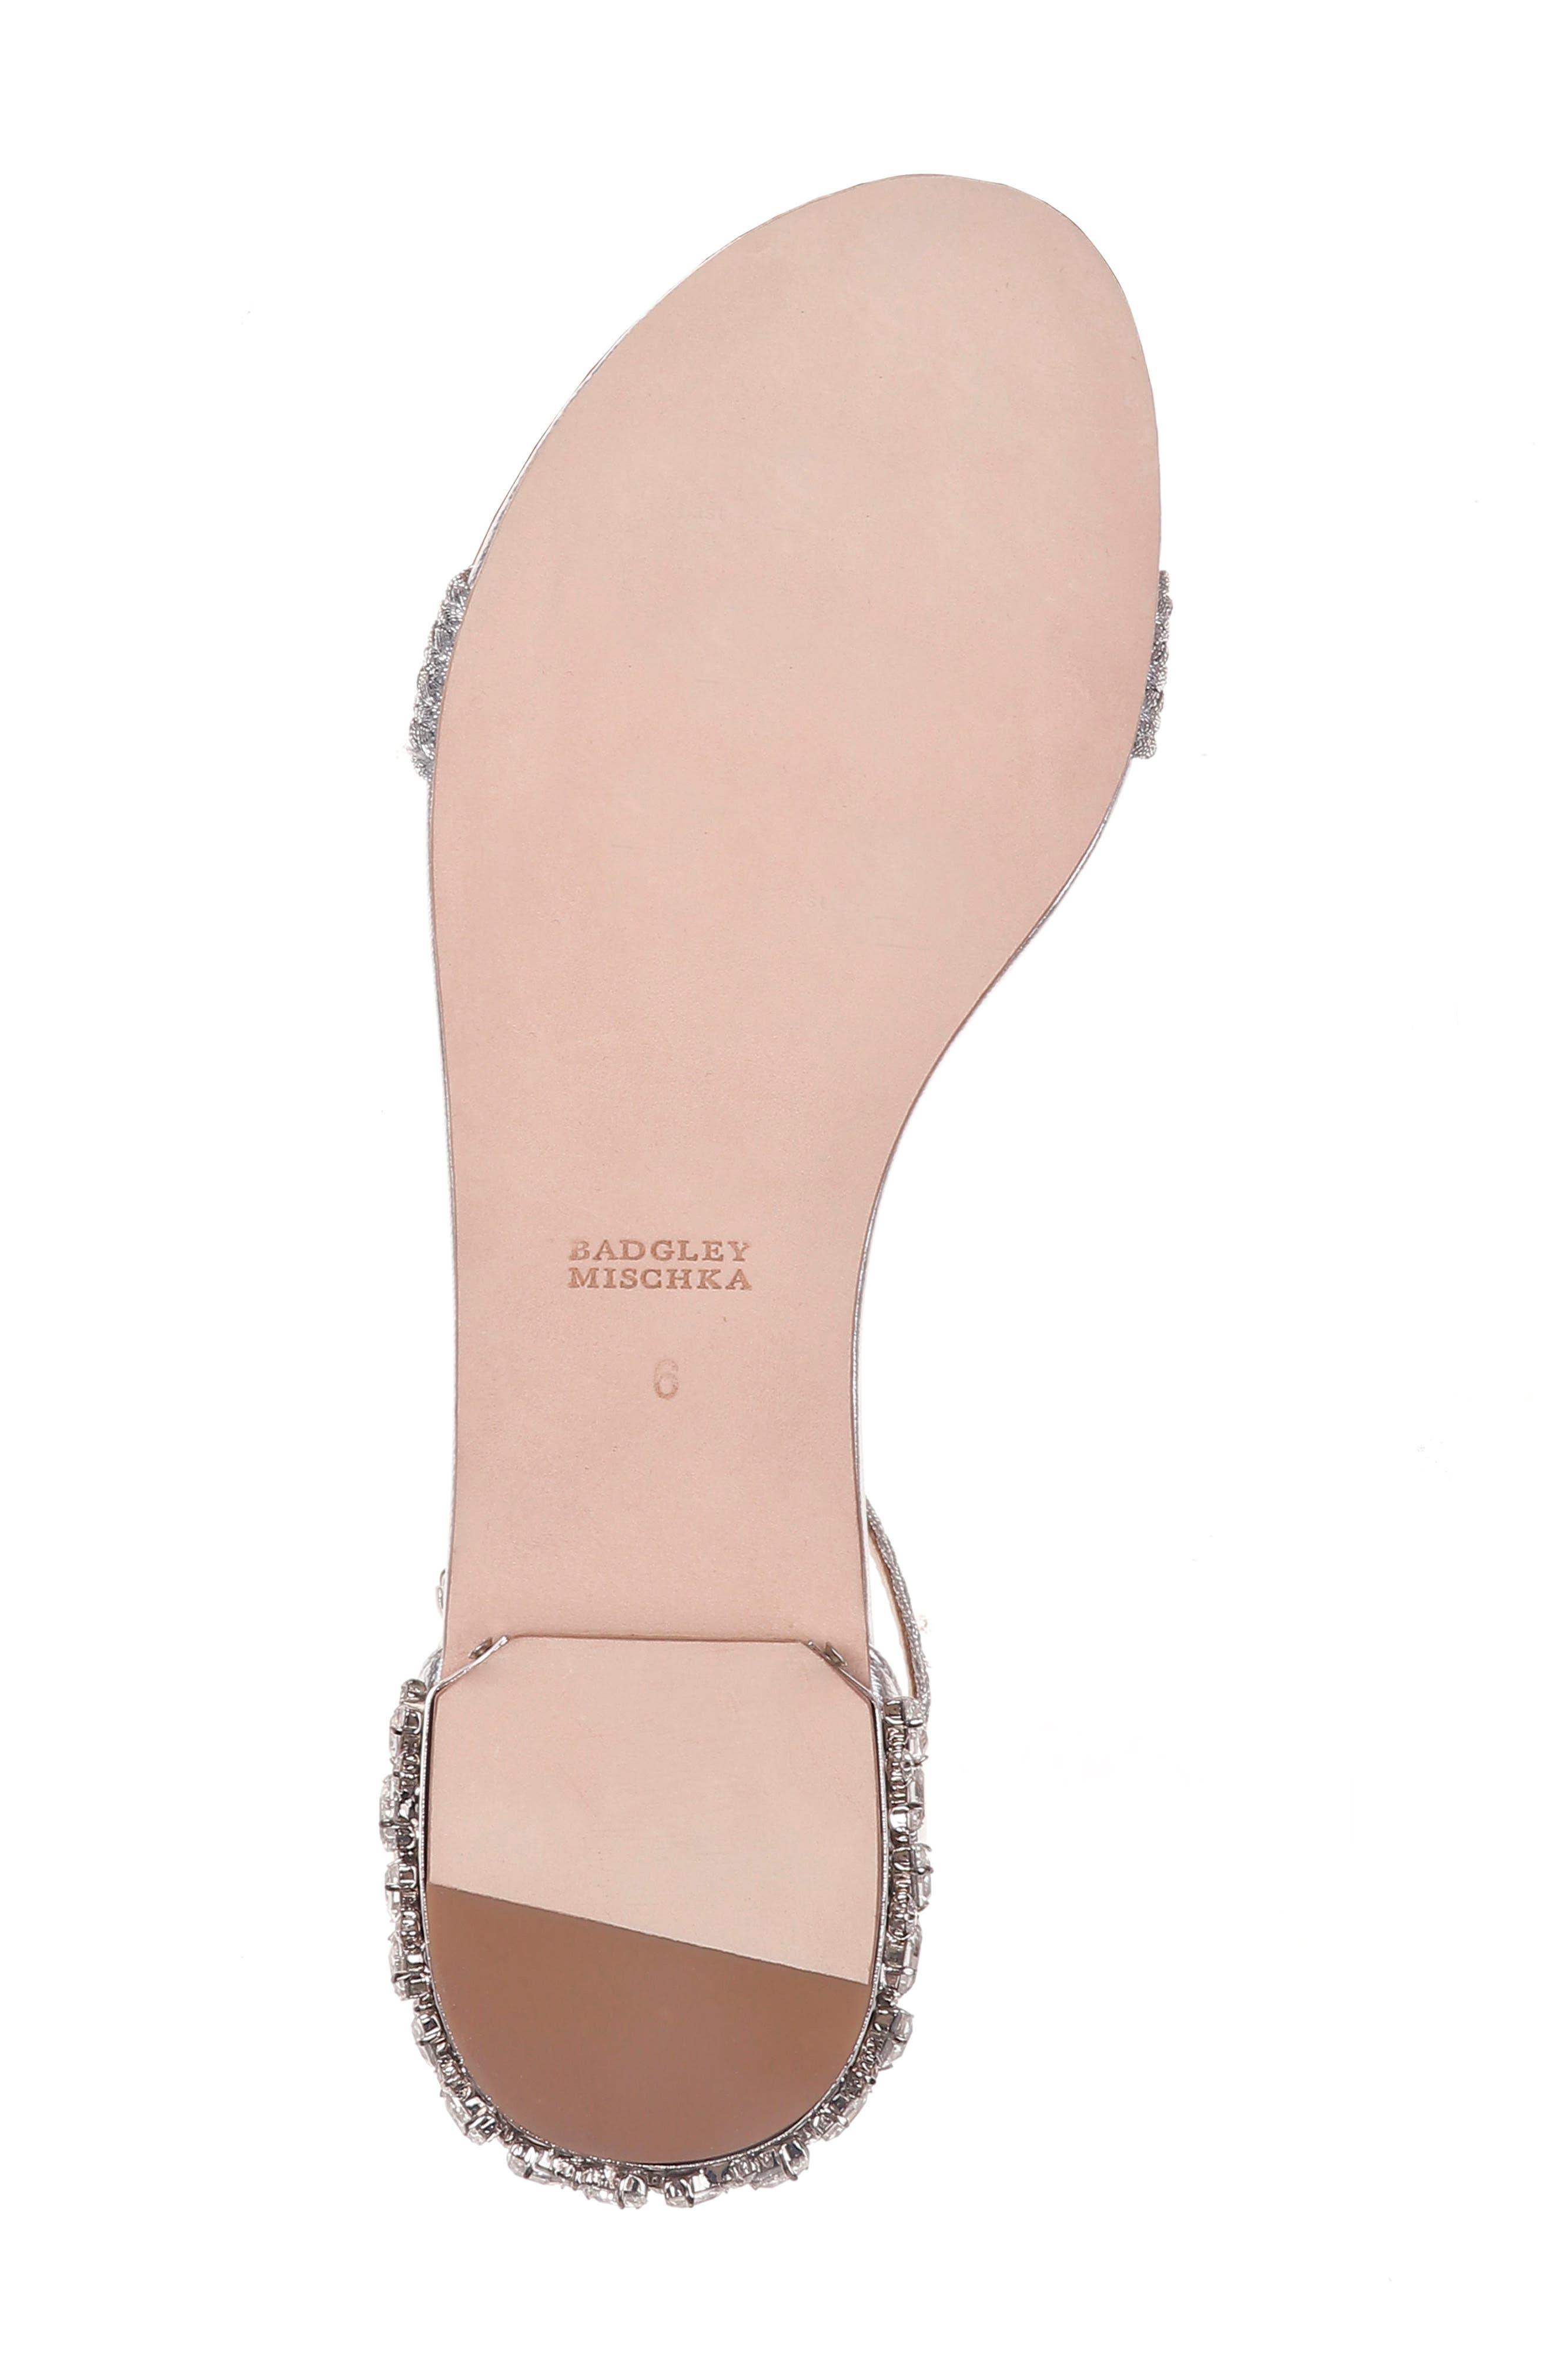 Steffie Ankle Strap Sandal,                             Alternate thumbnail 6, color,                             Silver Leather